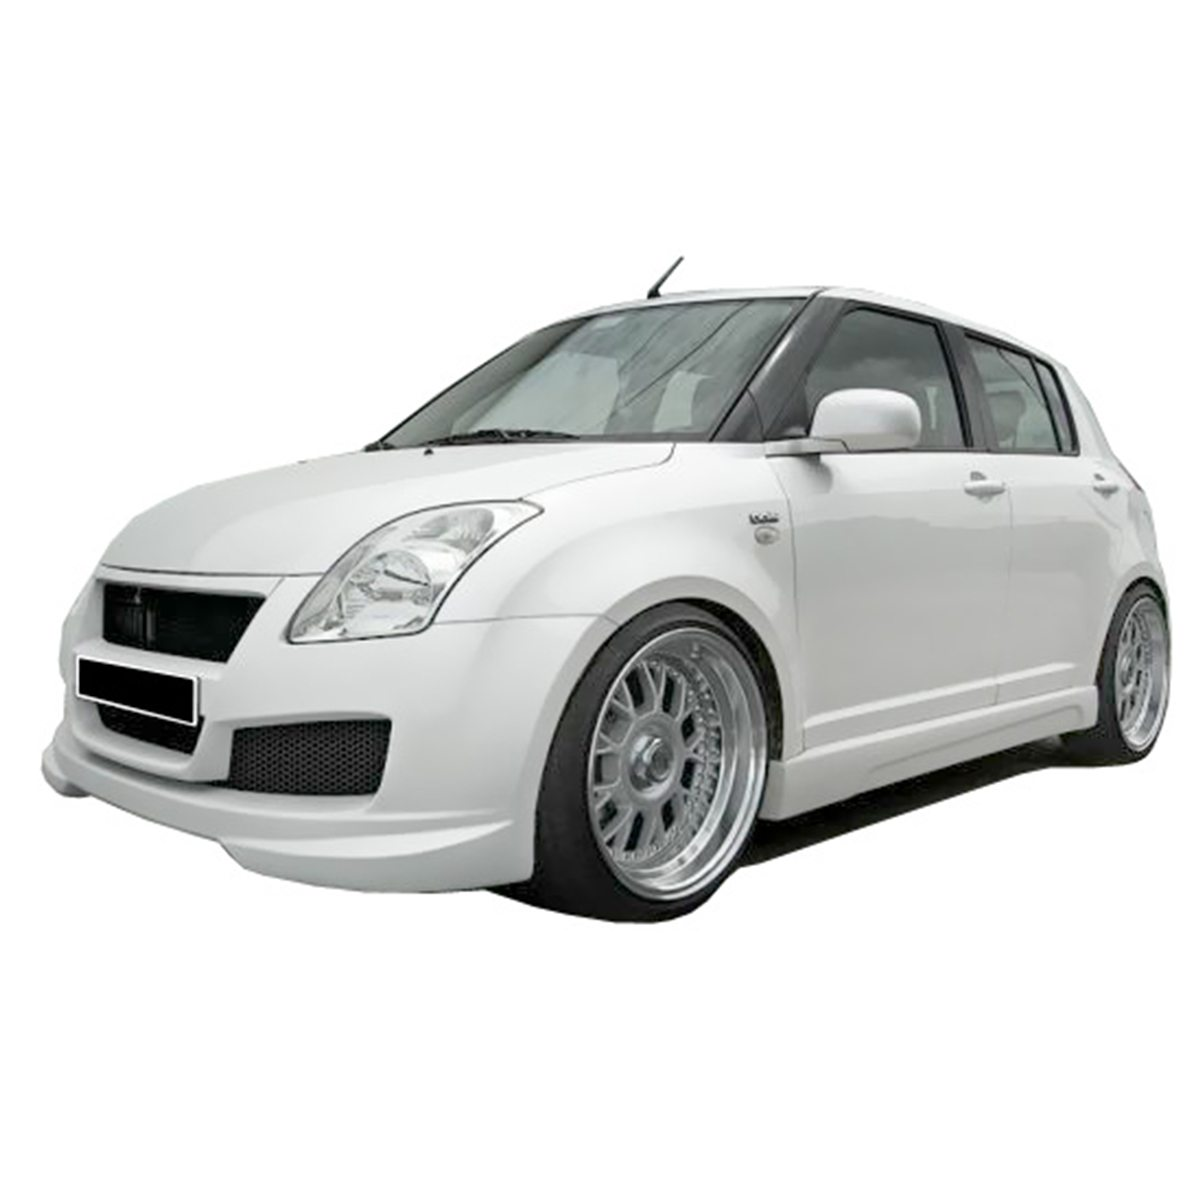 Suzuki-Swift-05-Velvet-Frt-PCS209